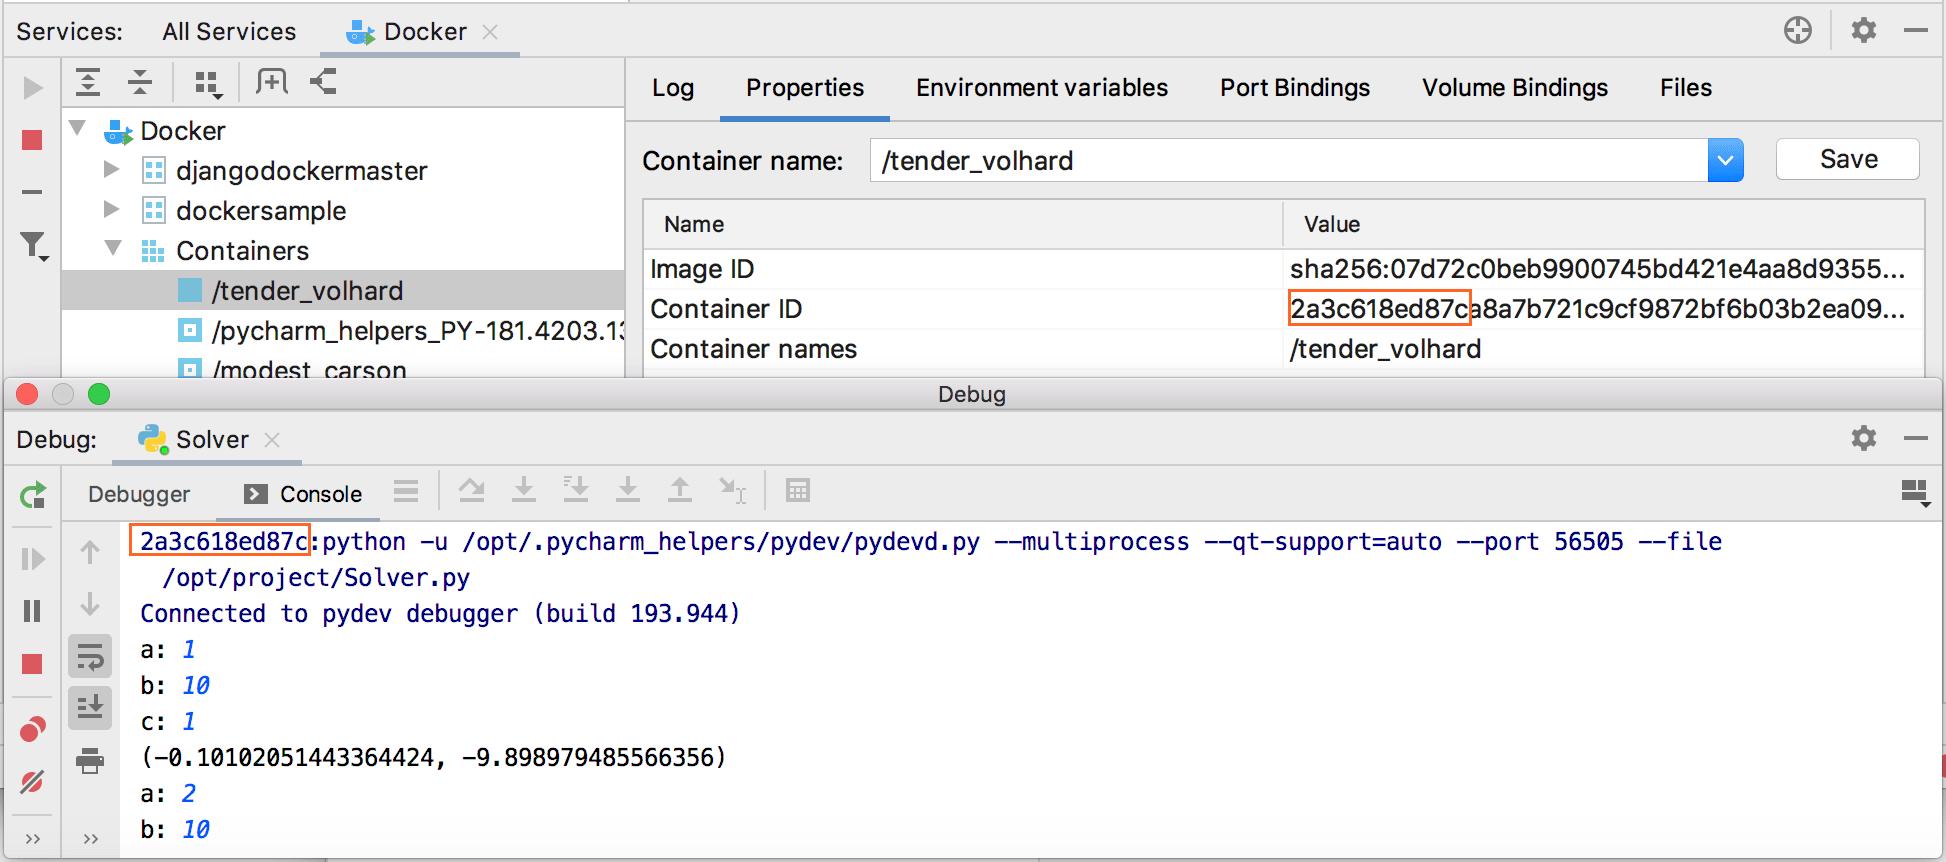 The Docker tool window and the Debug tool window